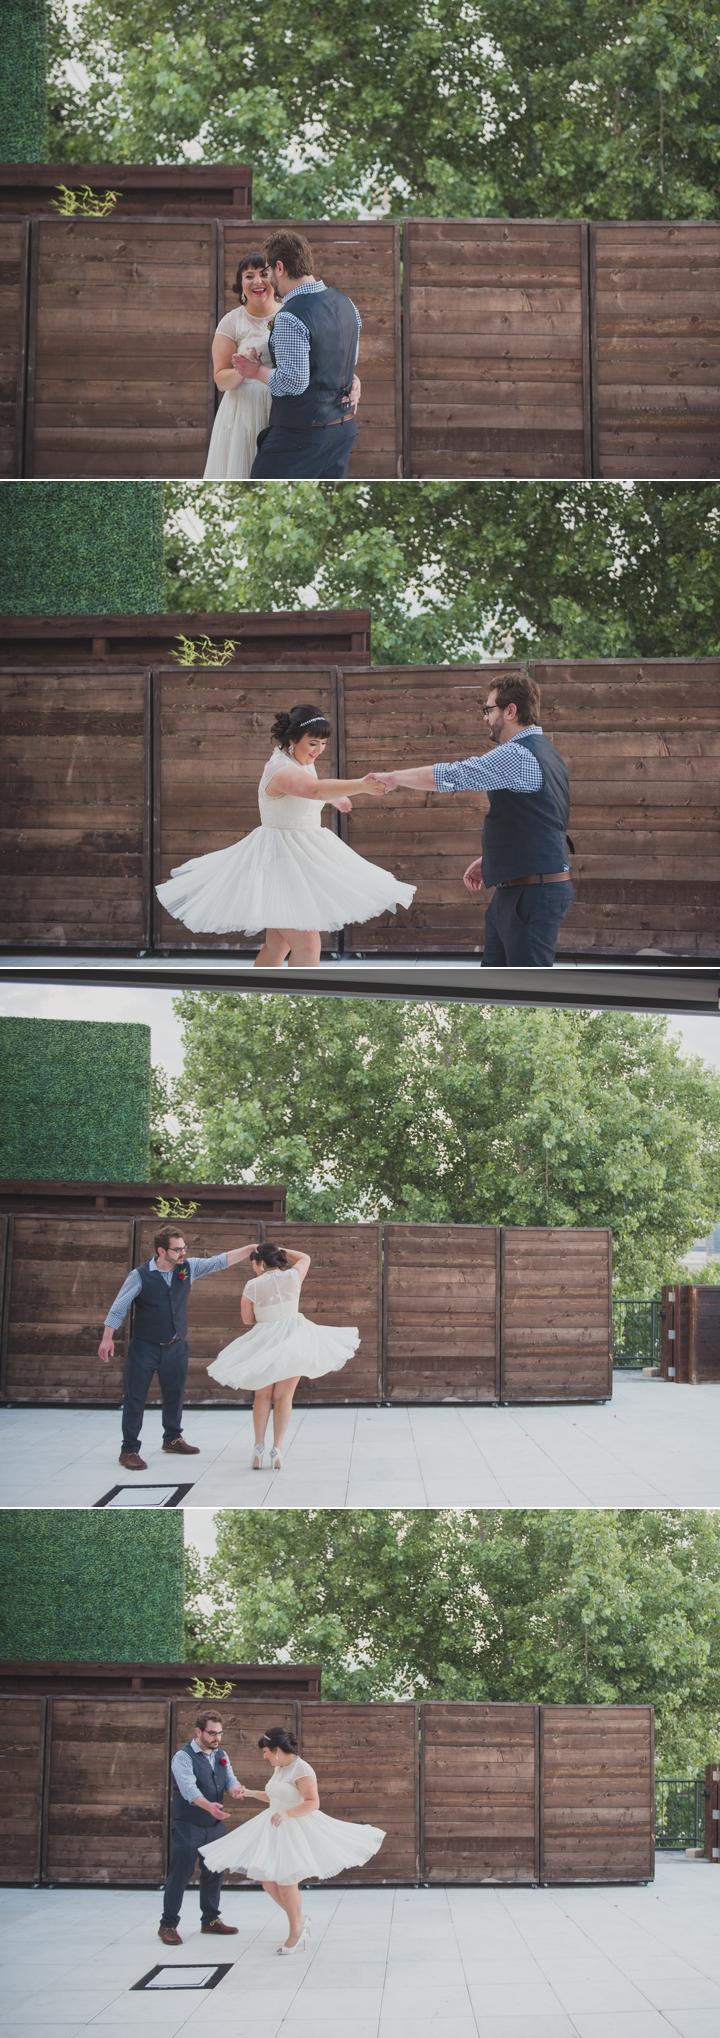 dallas-wedding-photographer-hw 55.jpg